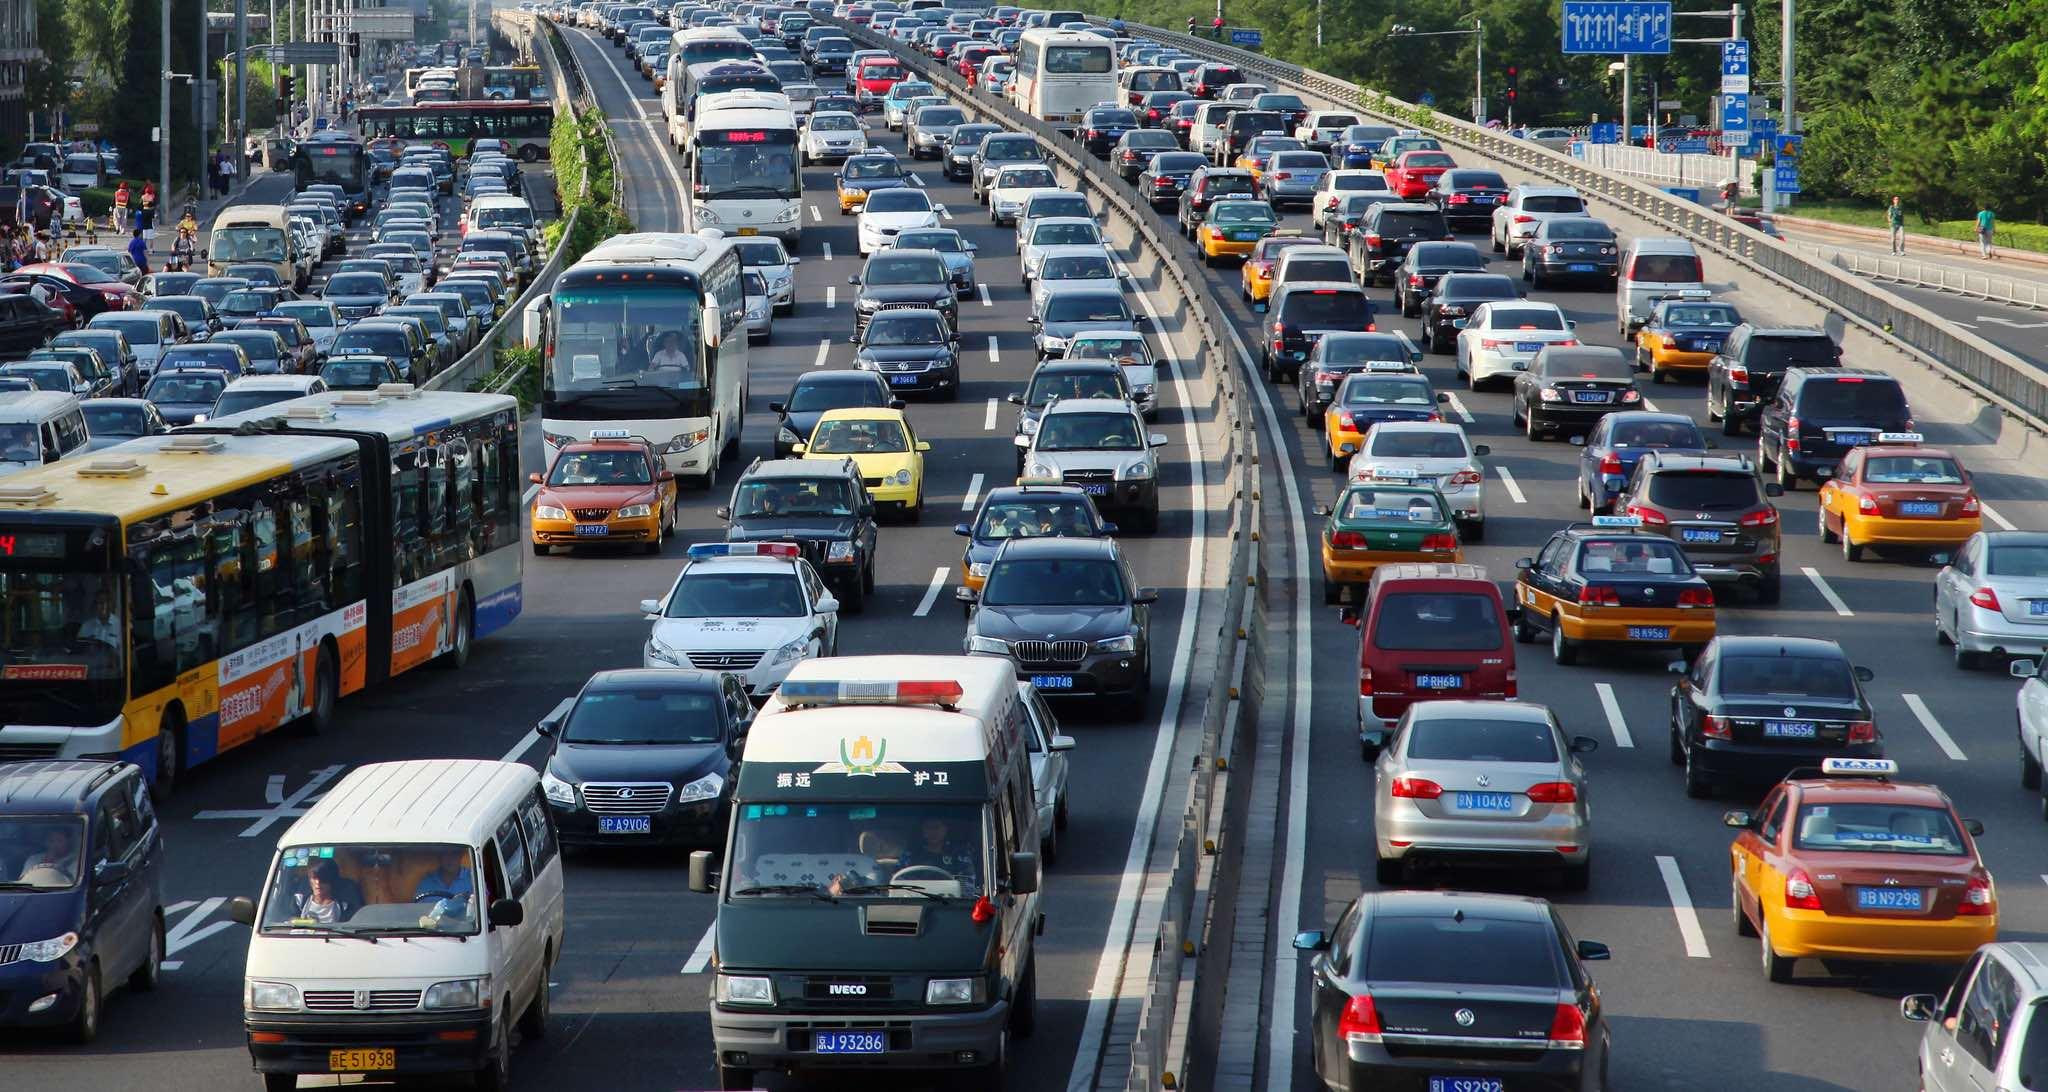 Traffic in Beijing, China (Photo: World Bank/Flickr)